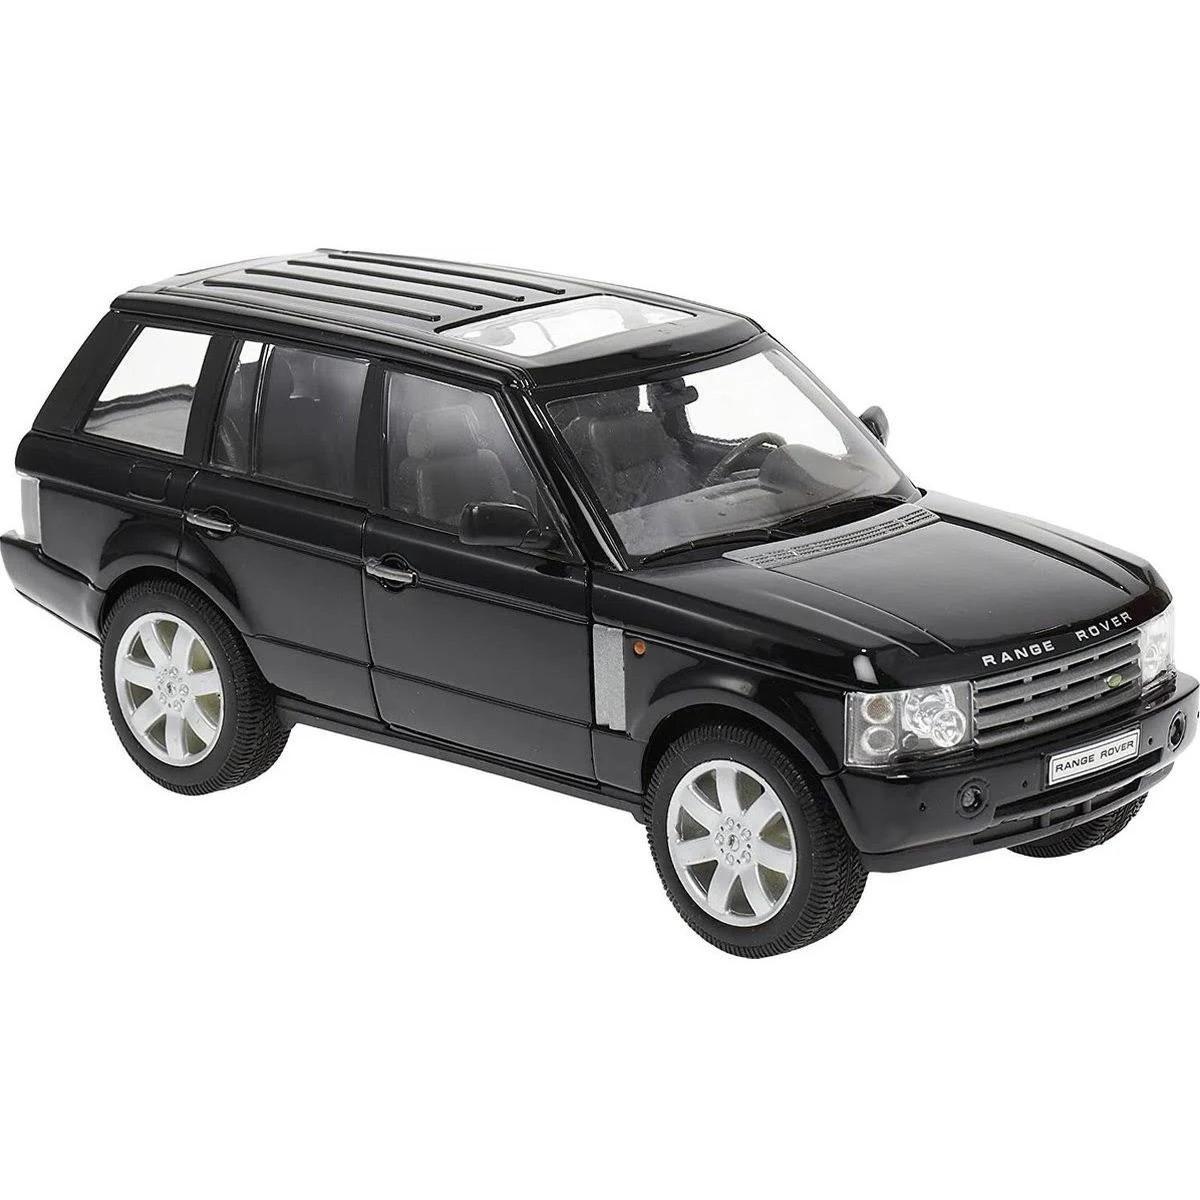 Modelauto Land Rover Range Rover 2003 zwart schaal 1:24/20 x 8 x 7 cm